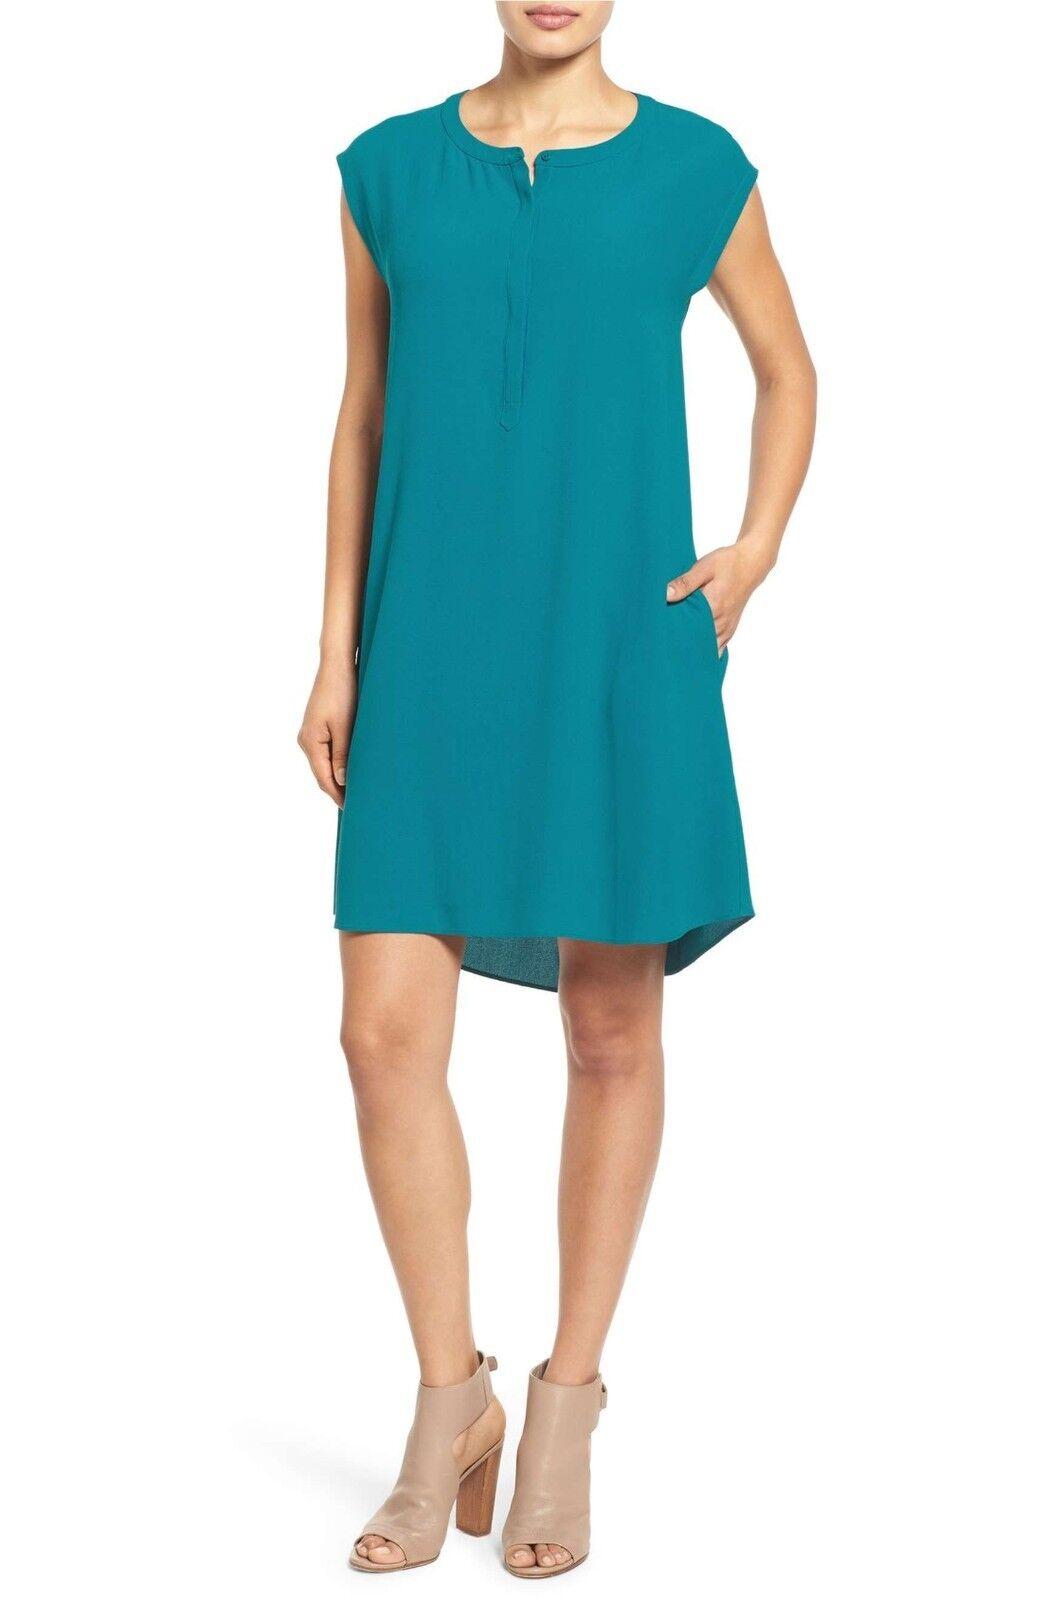 NWT Eileen Fisher Round Neck A-Line Silk Shift Dress Jewel Blau - XS